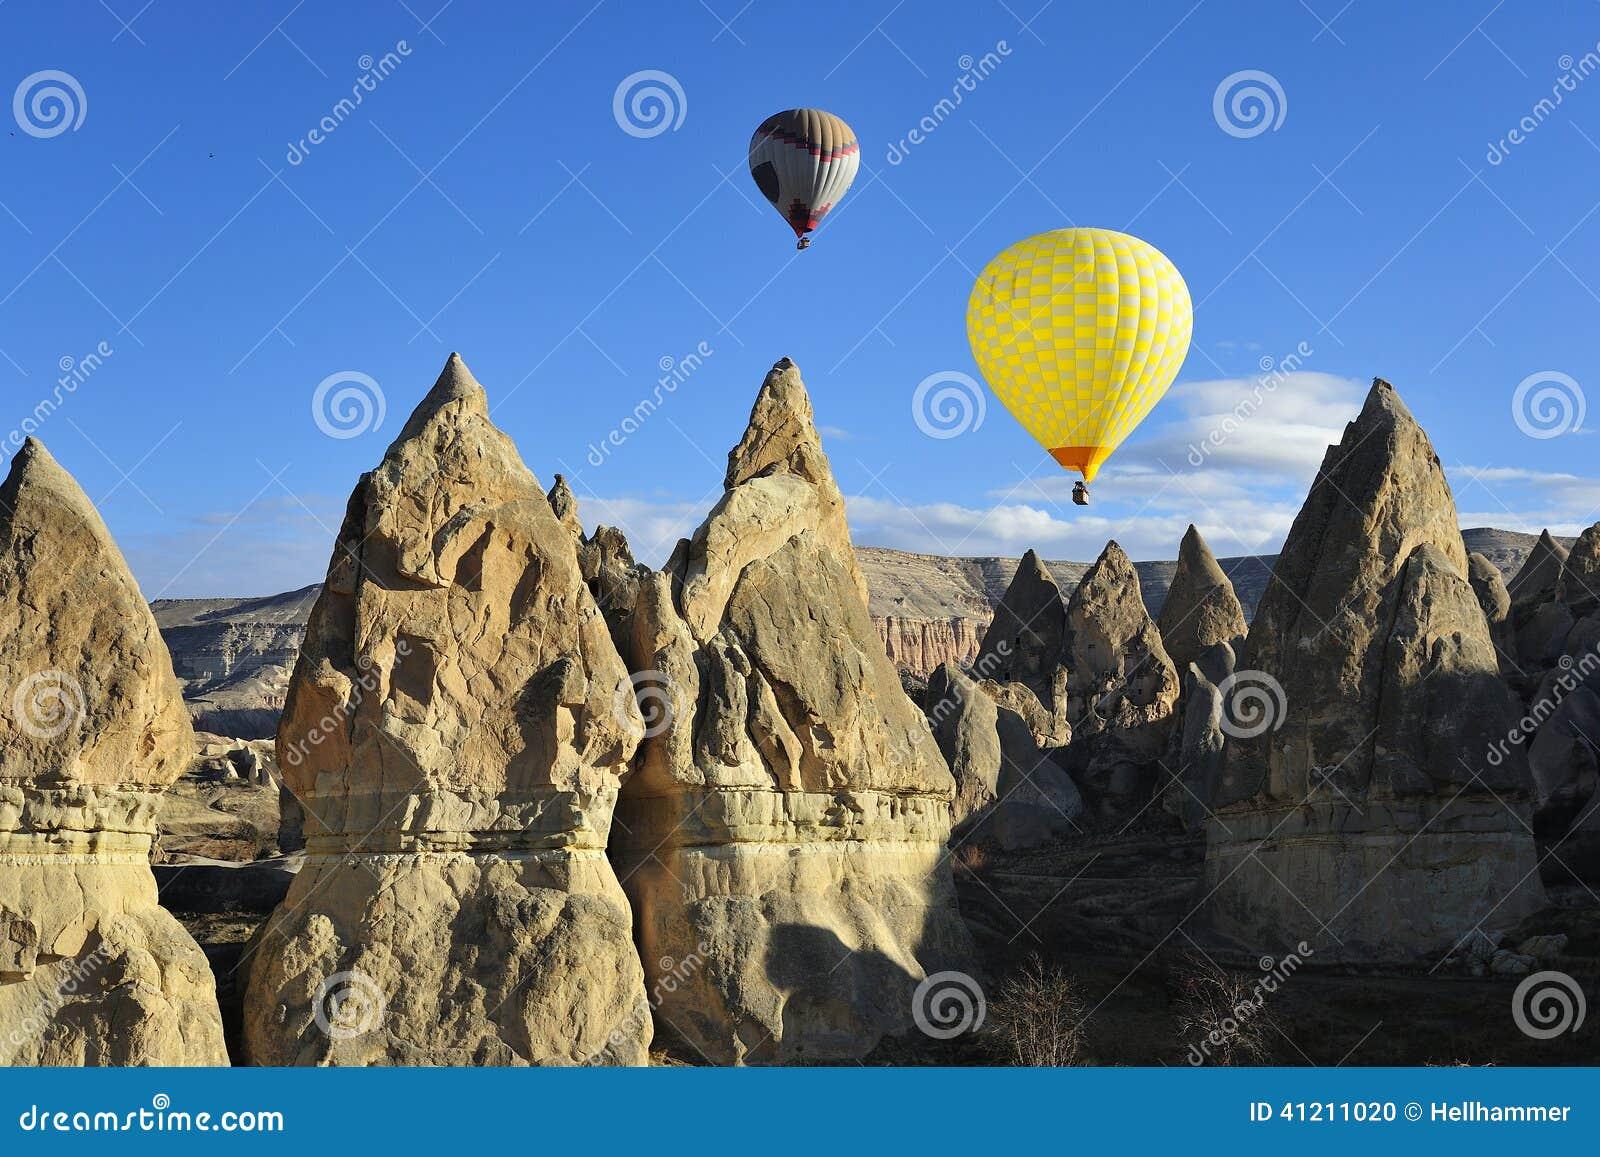 Voyage de ballon d air chaud dans le cappadocia, dinde